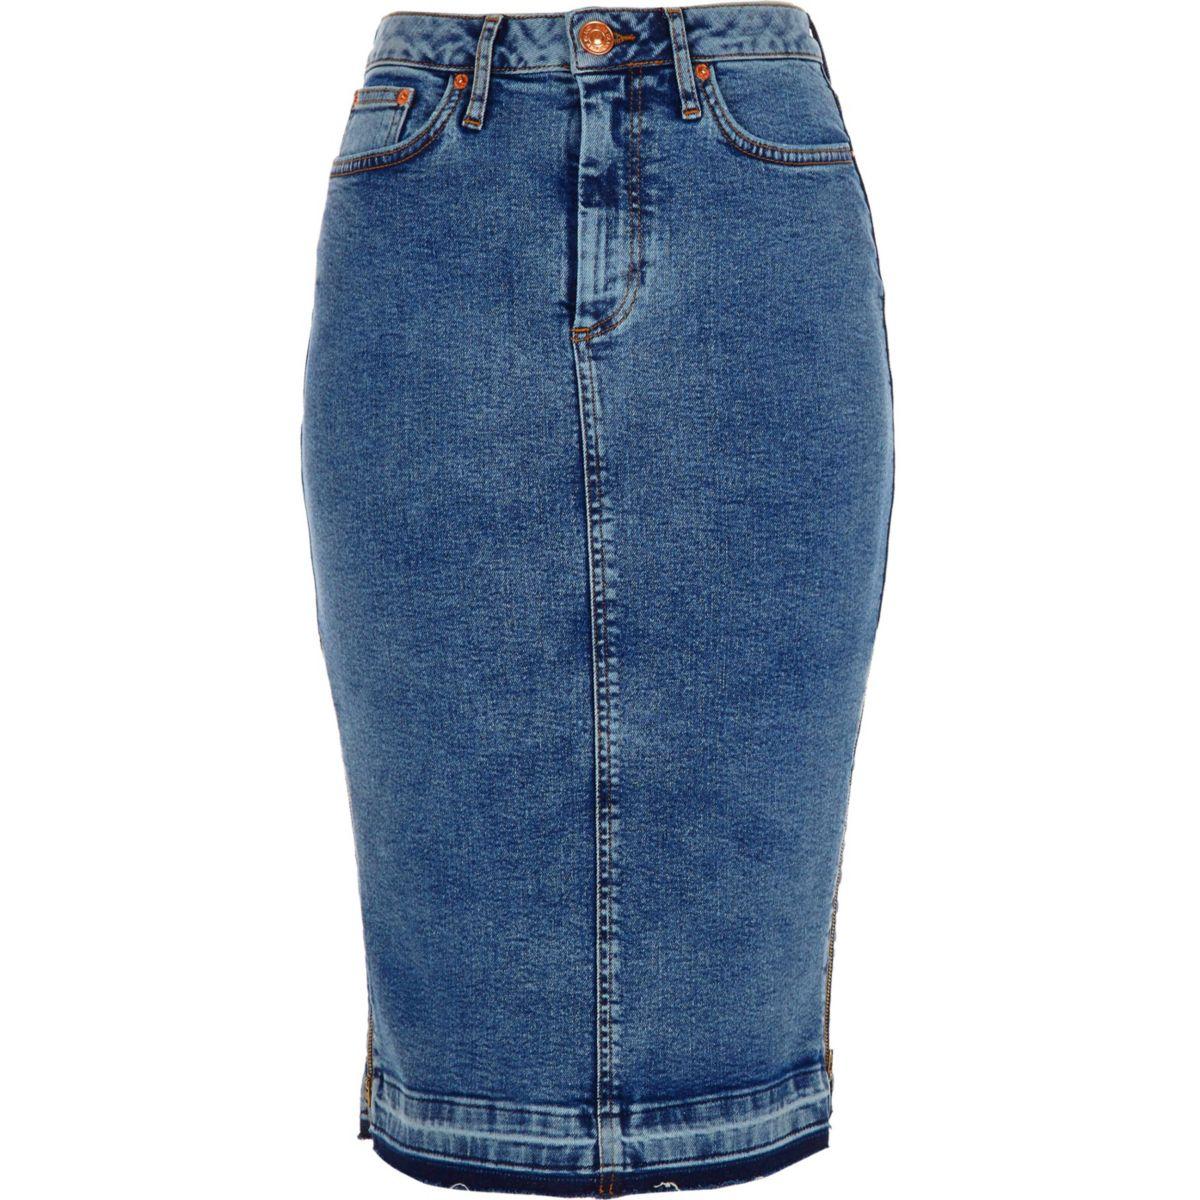 Mid blue acid wash denim pencil skirt